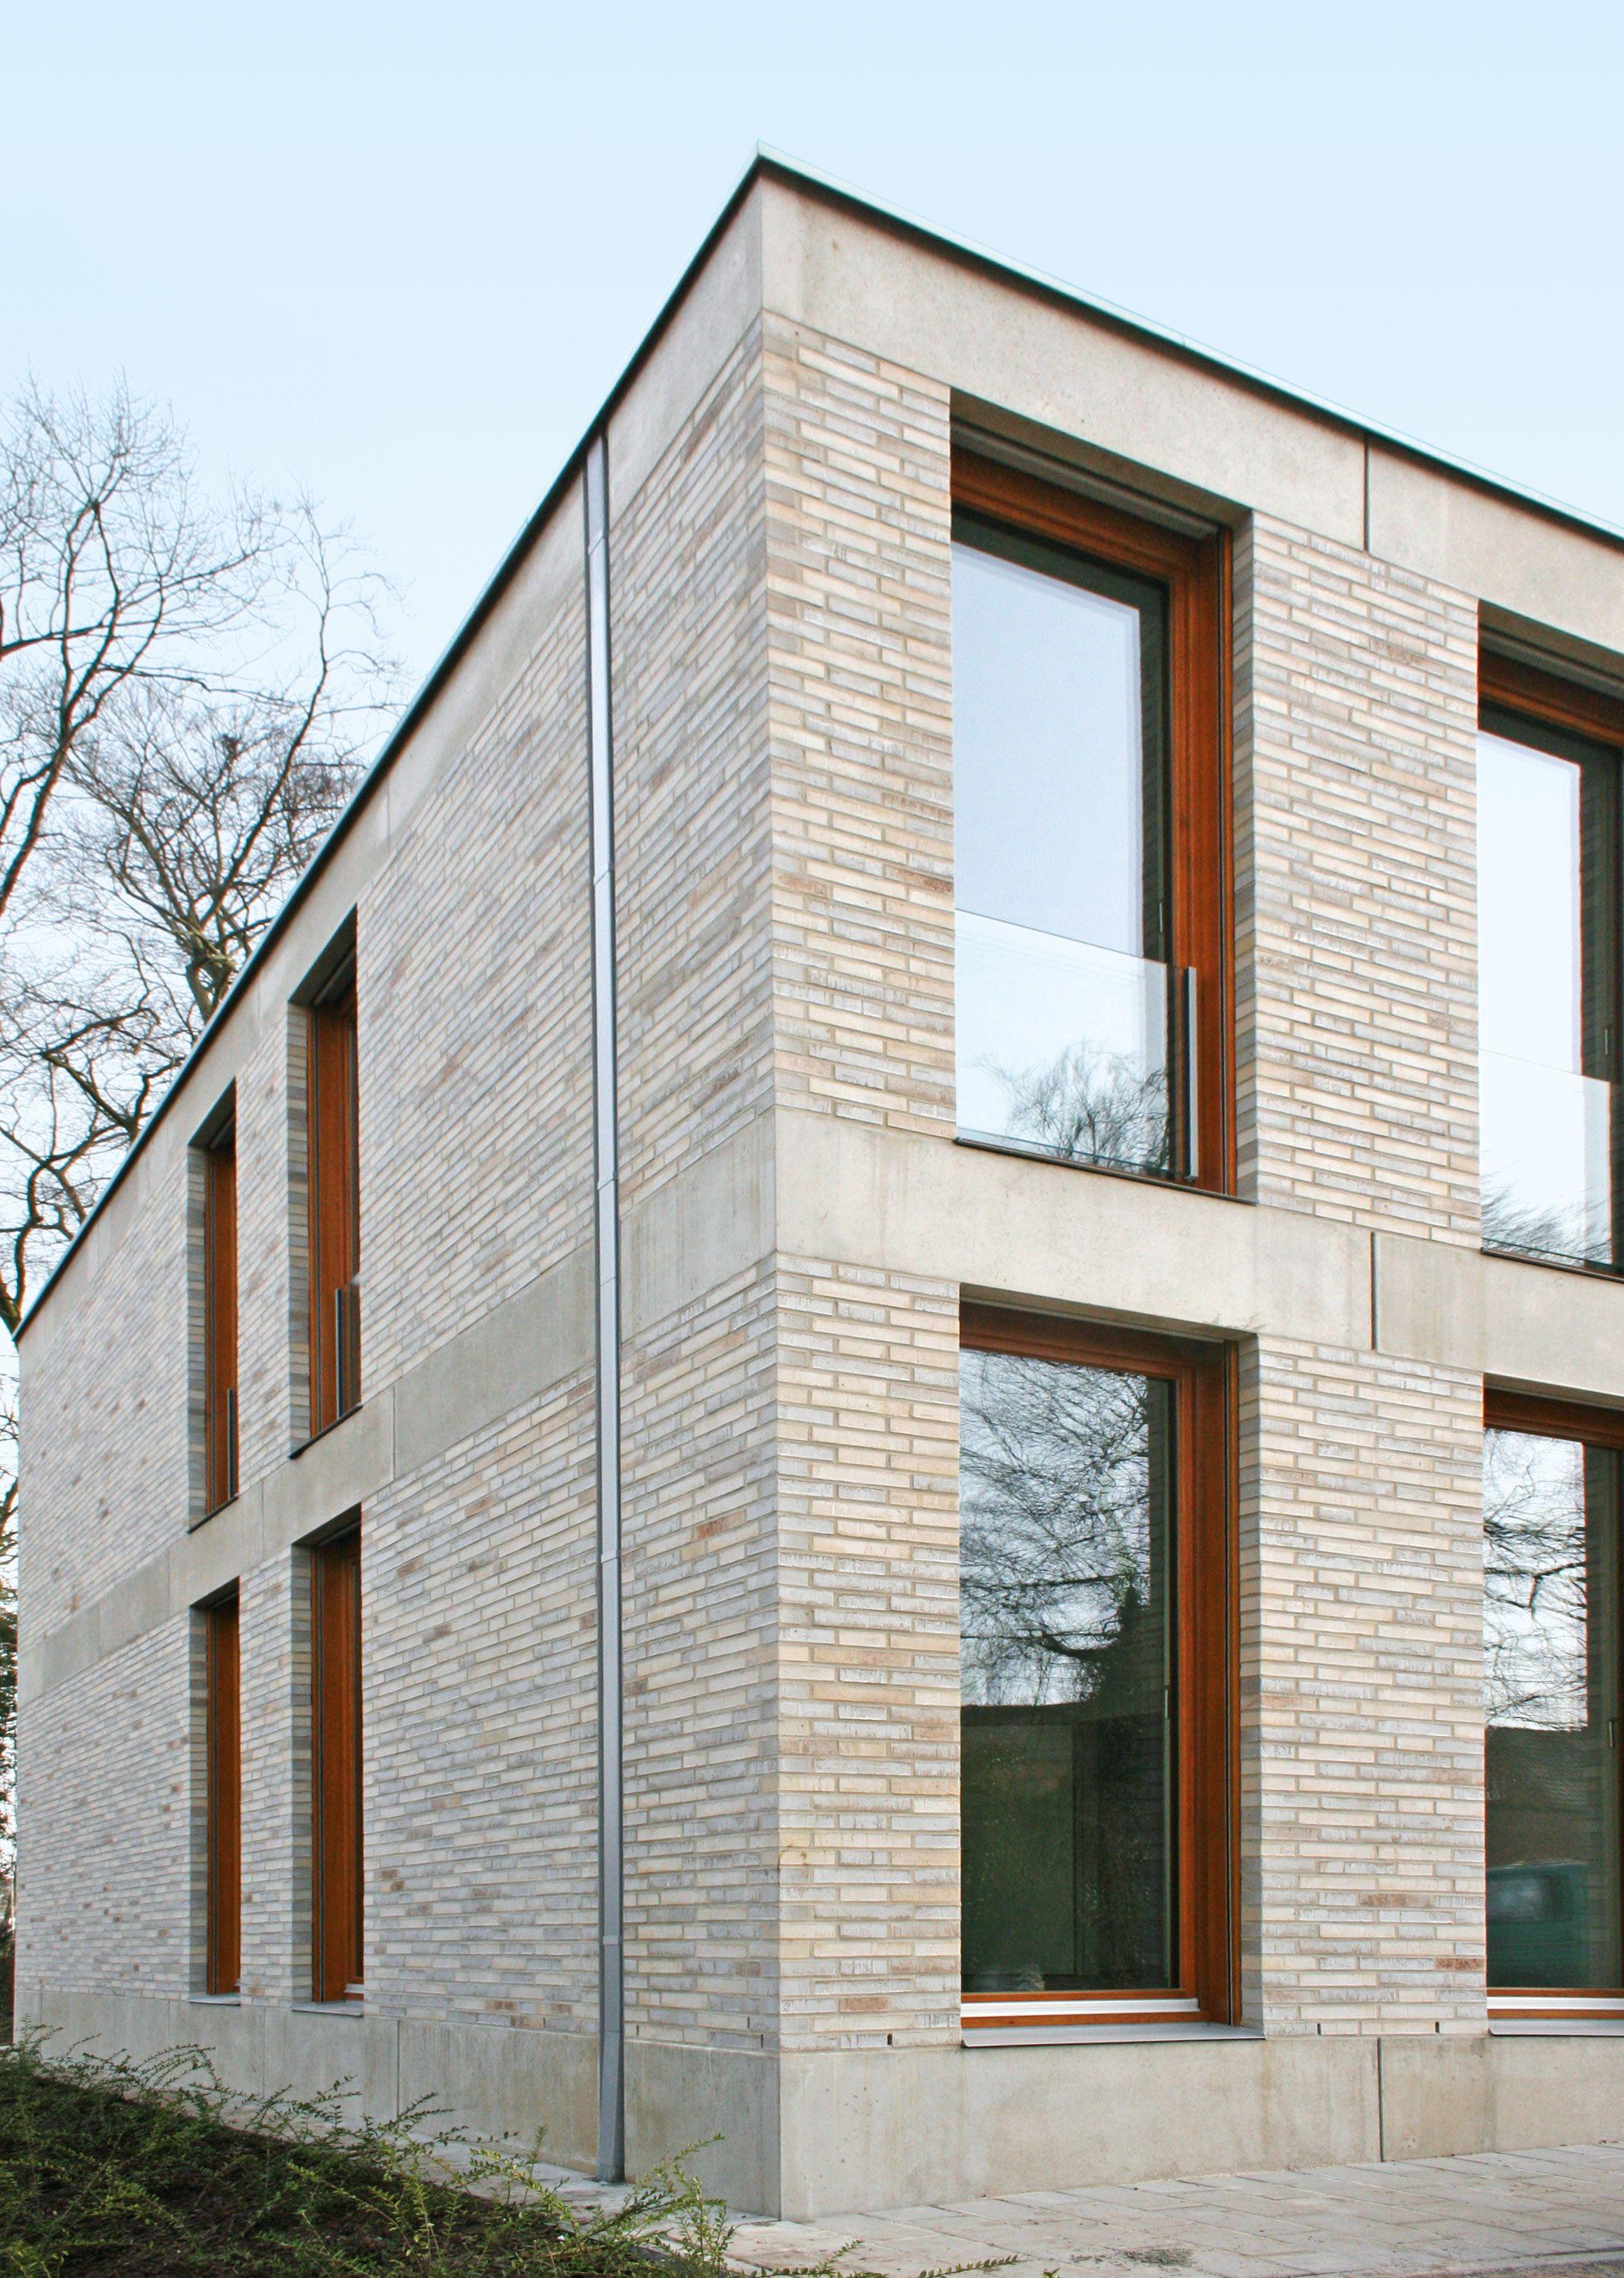 Fallrohr fassade  Zentralrendantur Emsdetten | Referenzen | Fassaden-Projekte ...